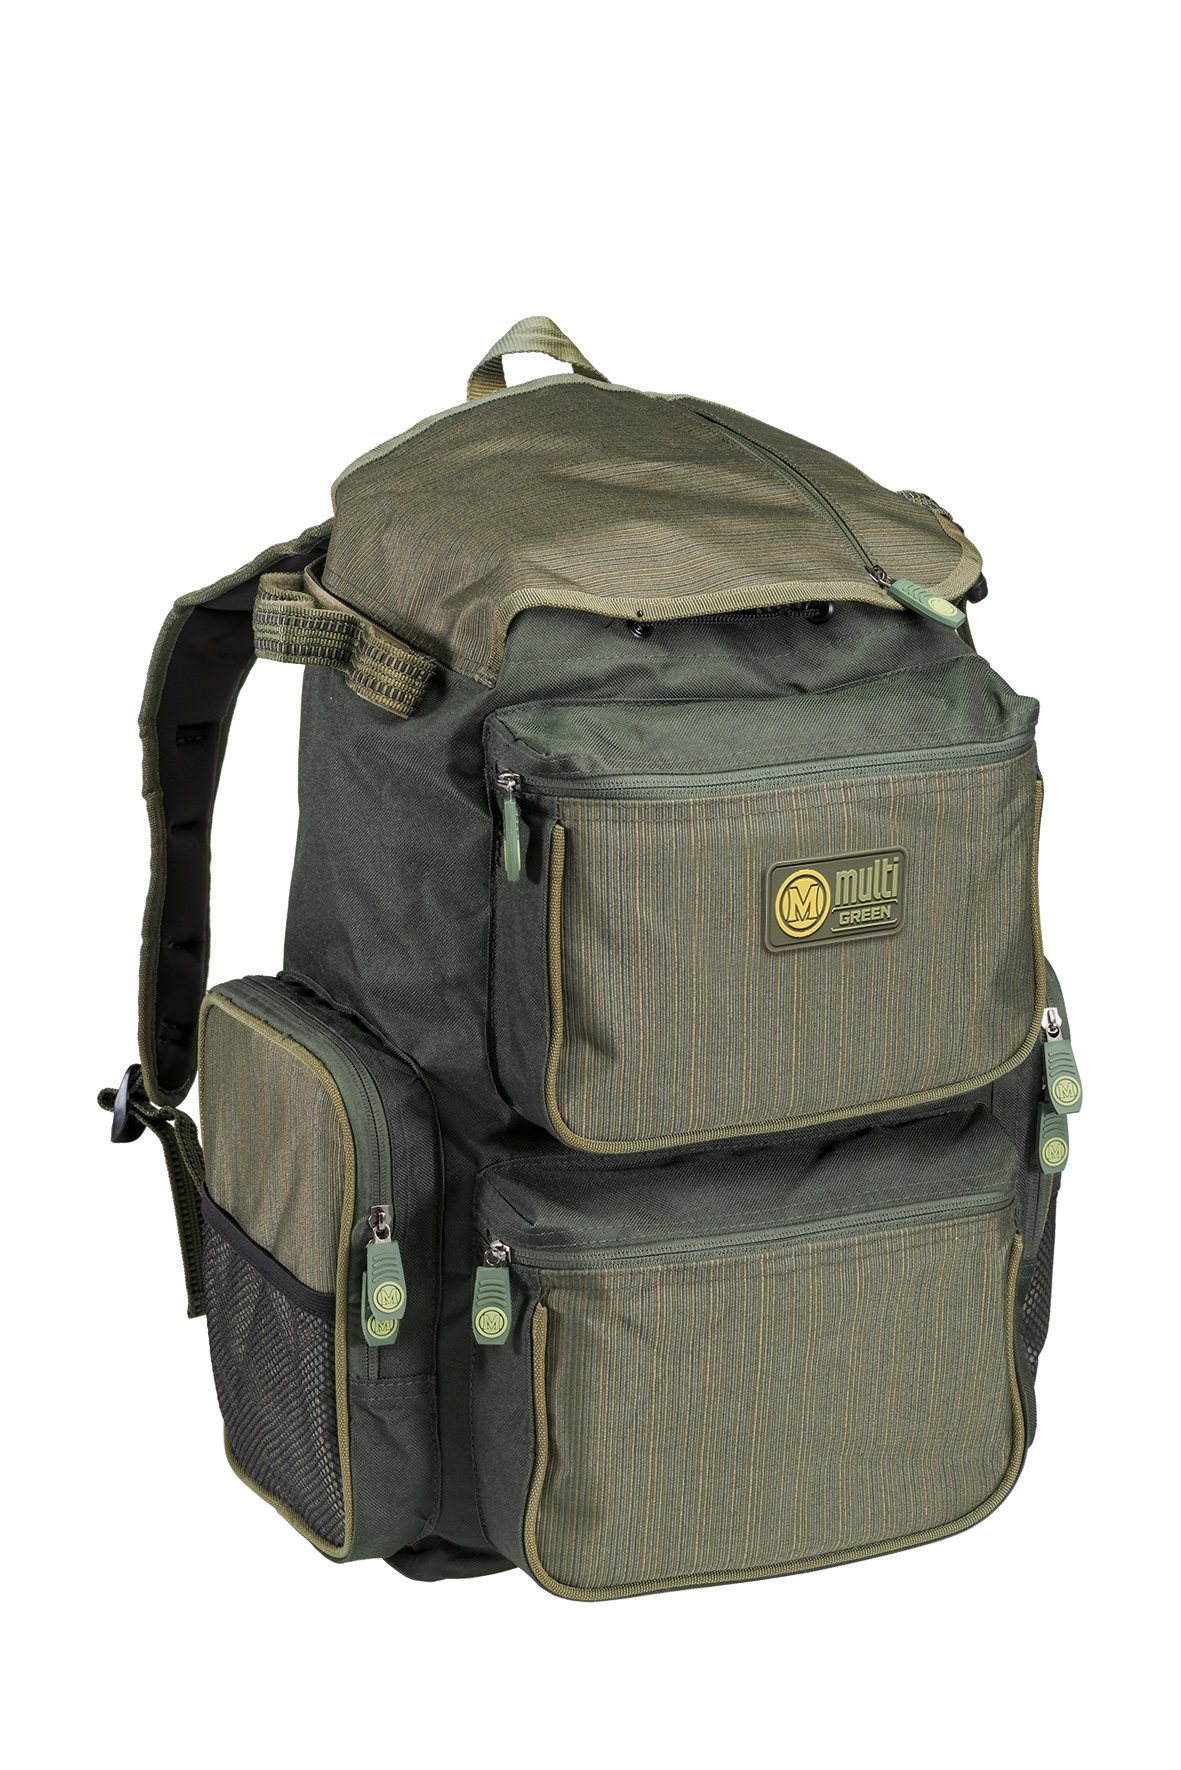 Batoh Multi Green 30